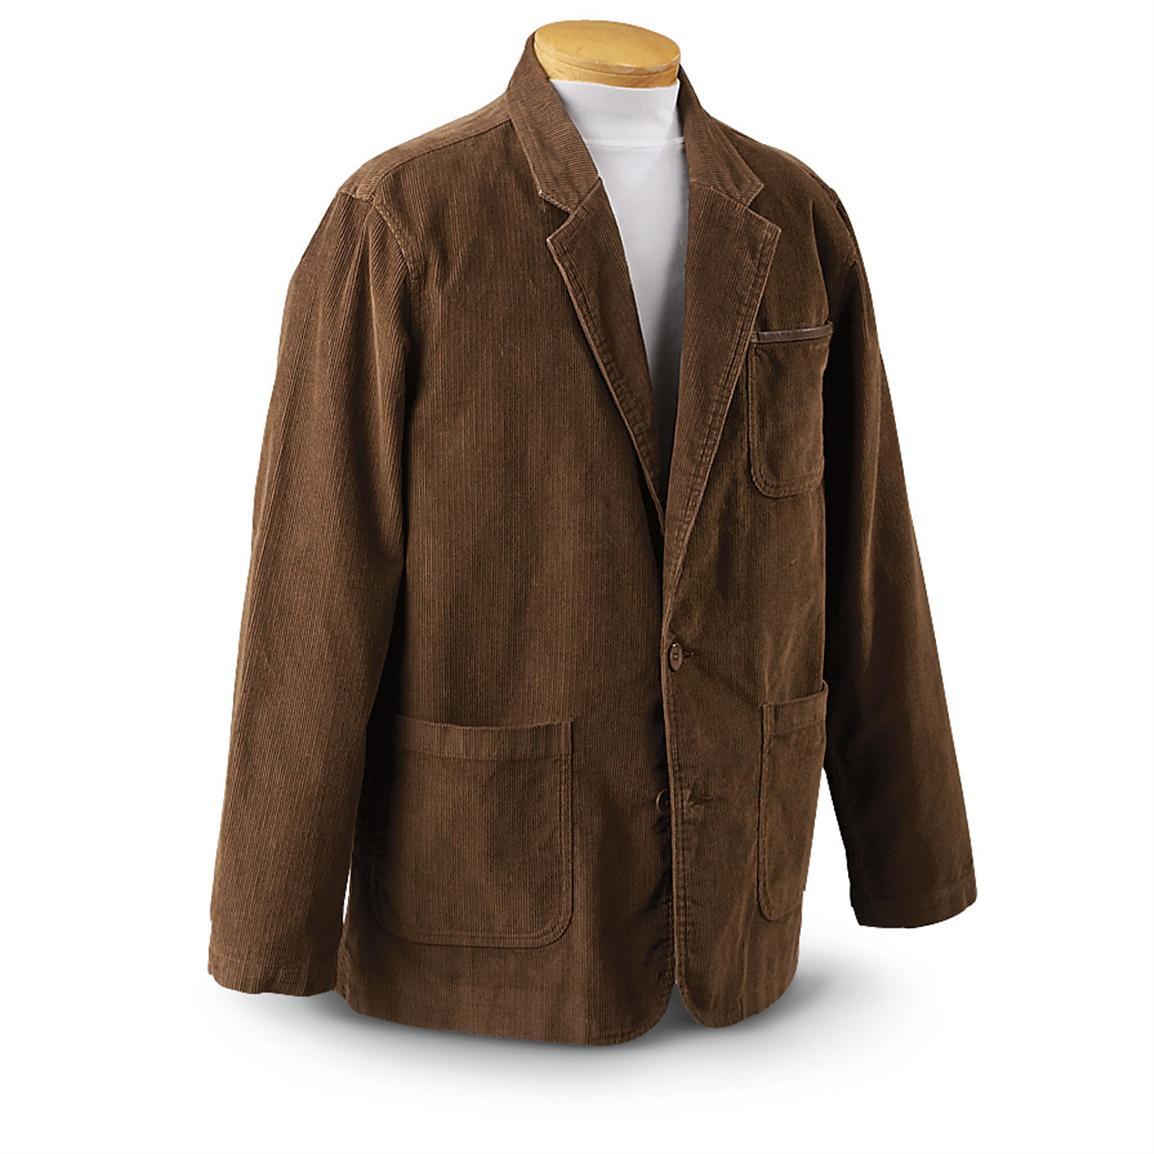 corduroy jacket guide gear® outdoor corduroy blazer, brown dfczefs